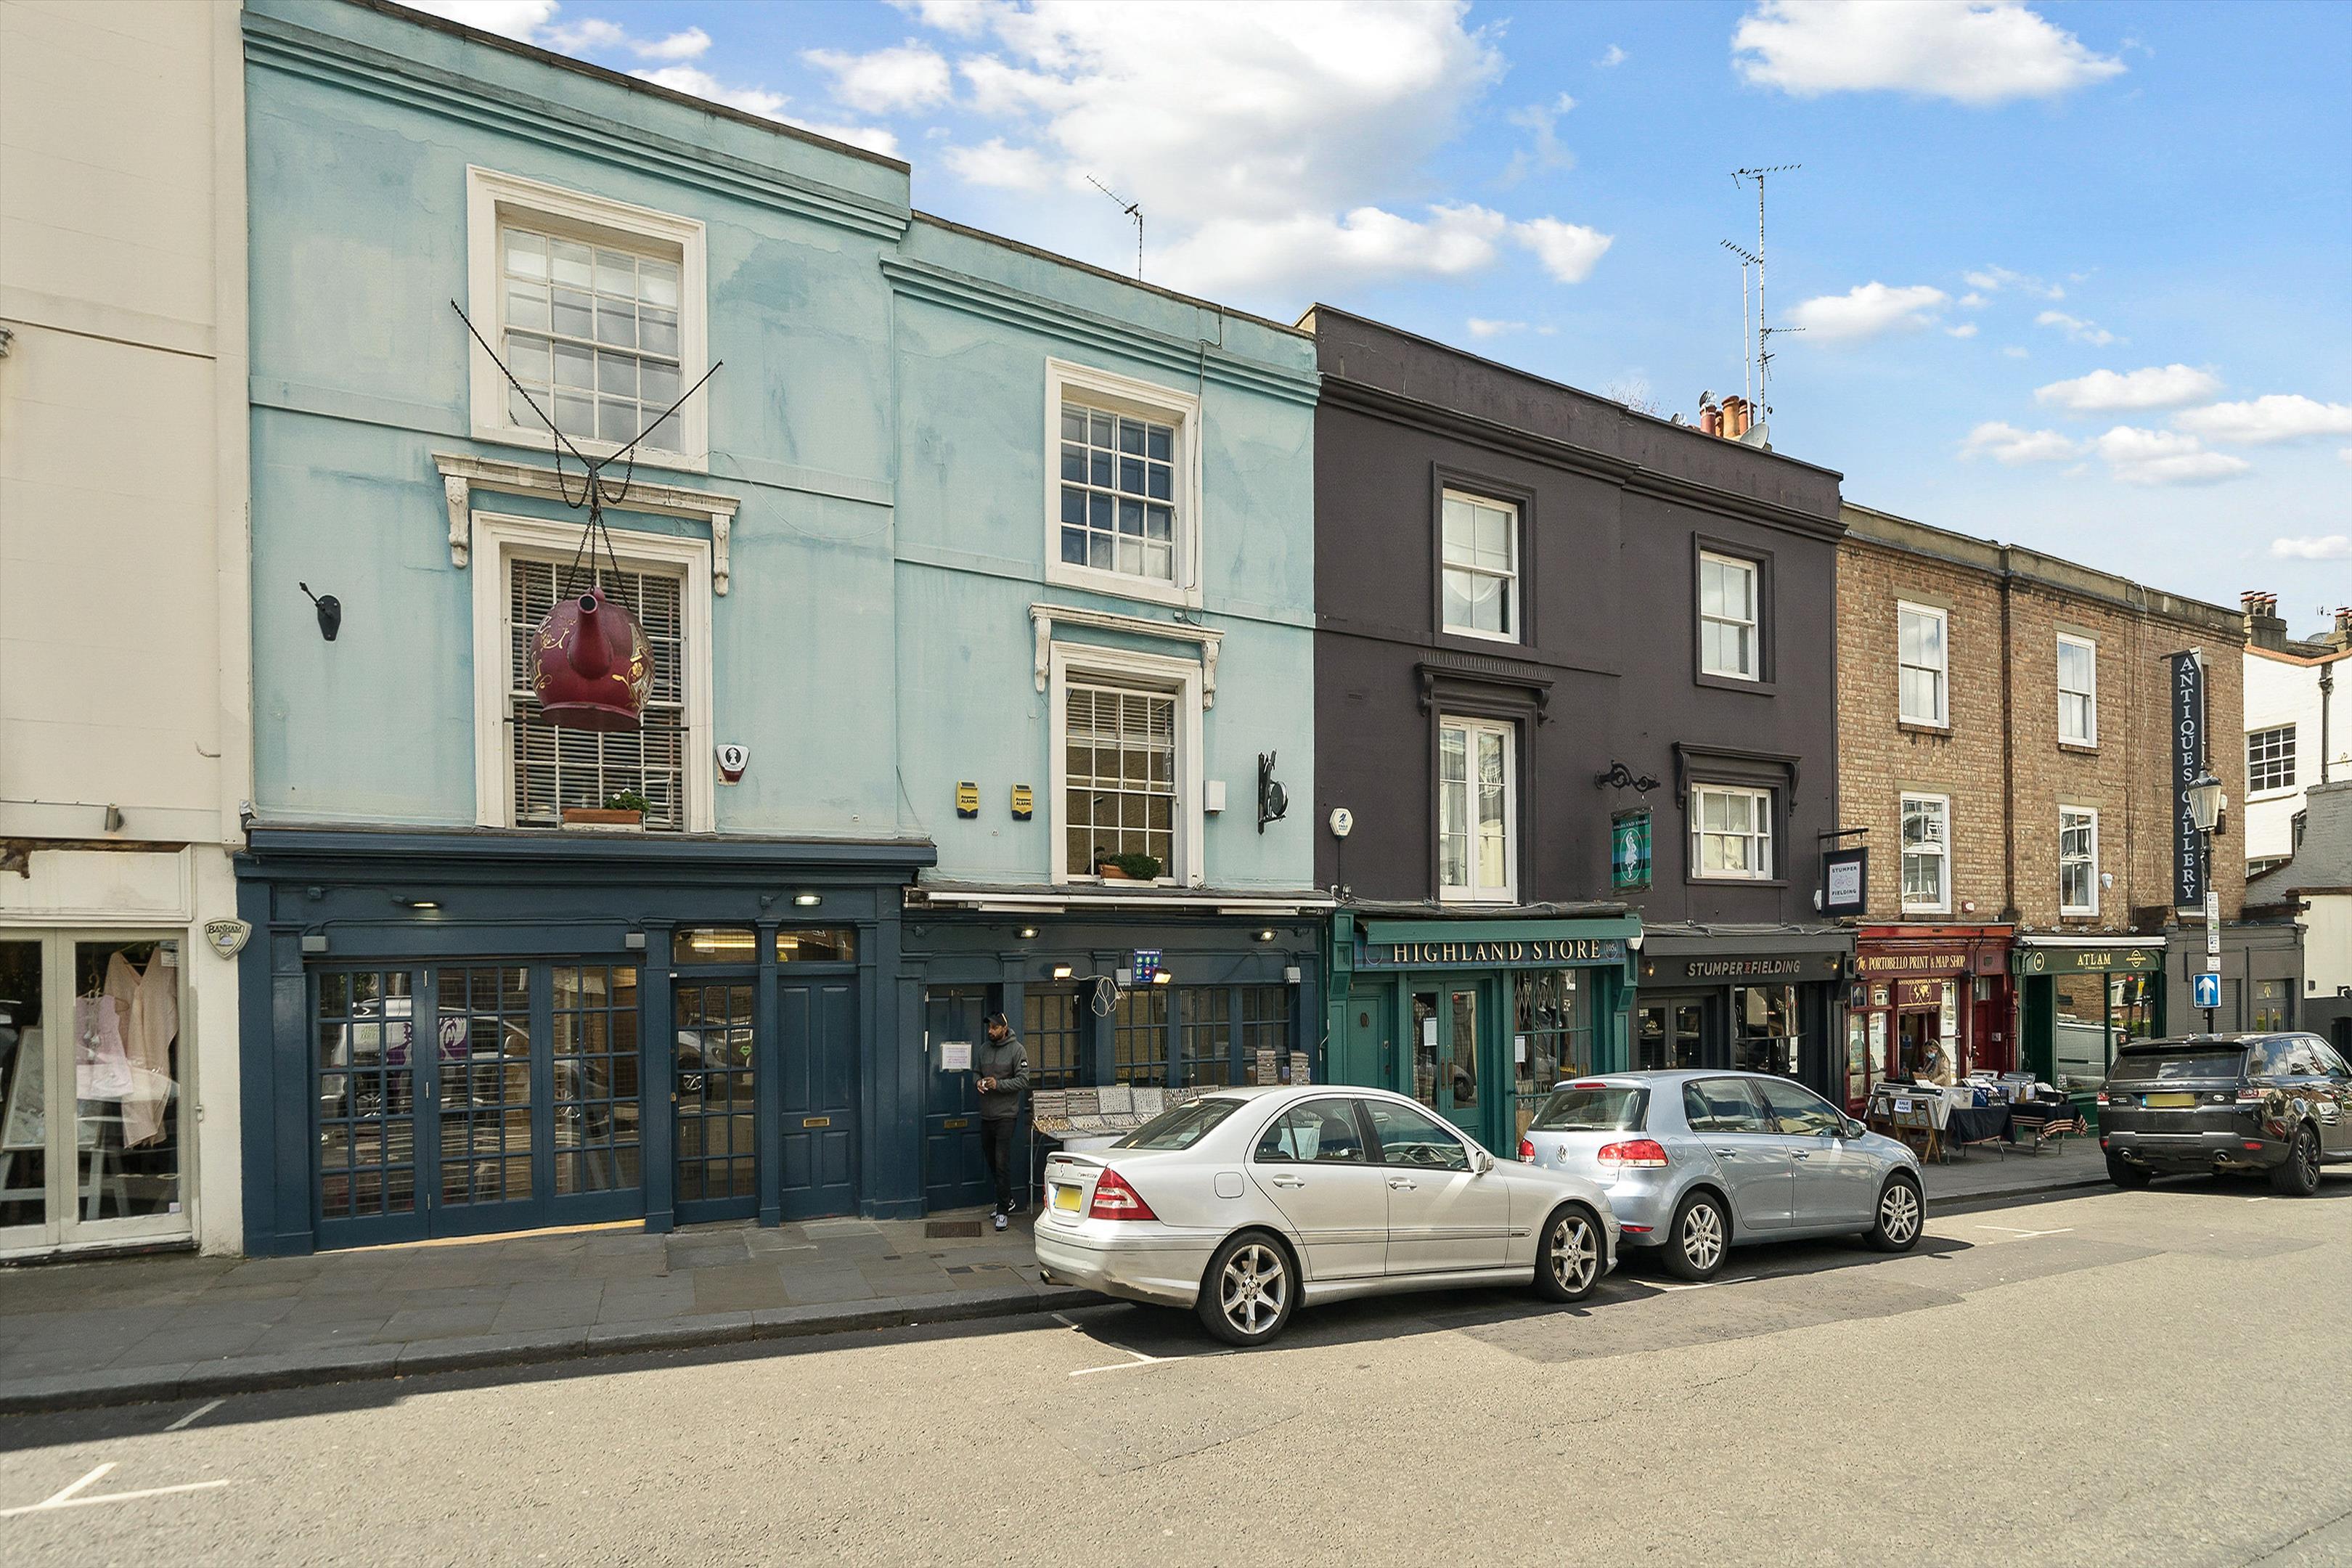 Portobello Rd, London W11, UK - Source: Knight Frank